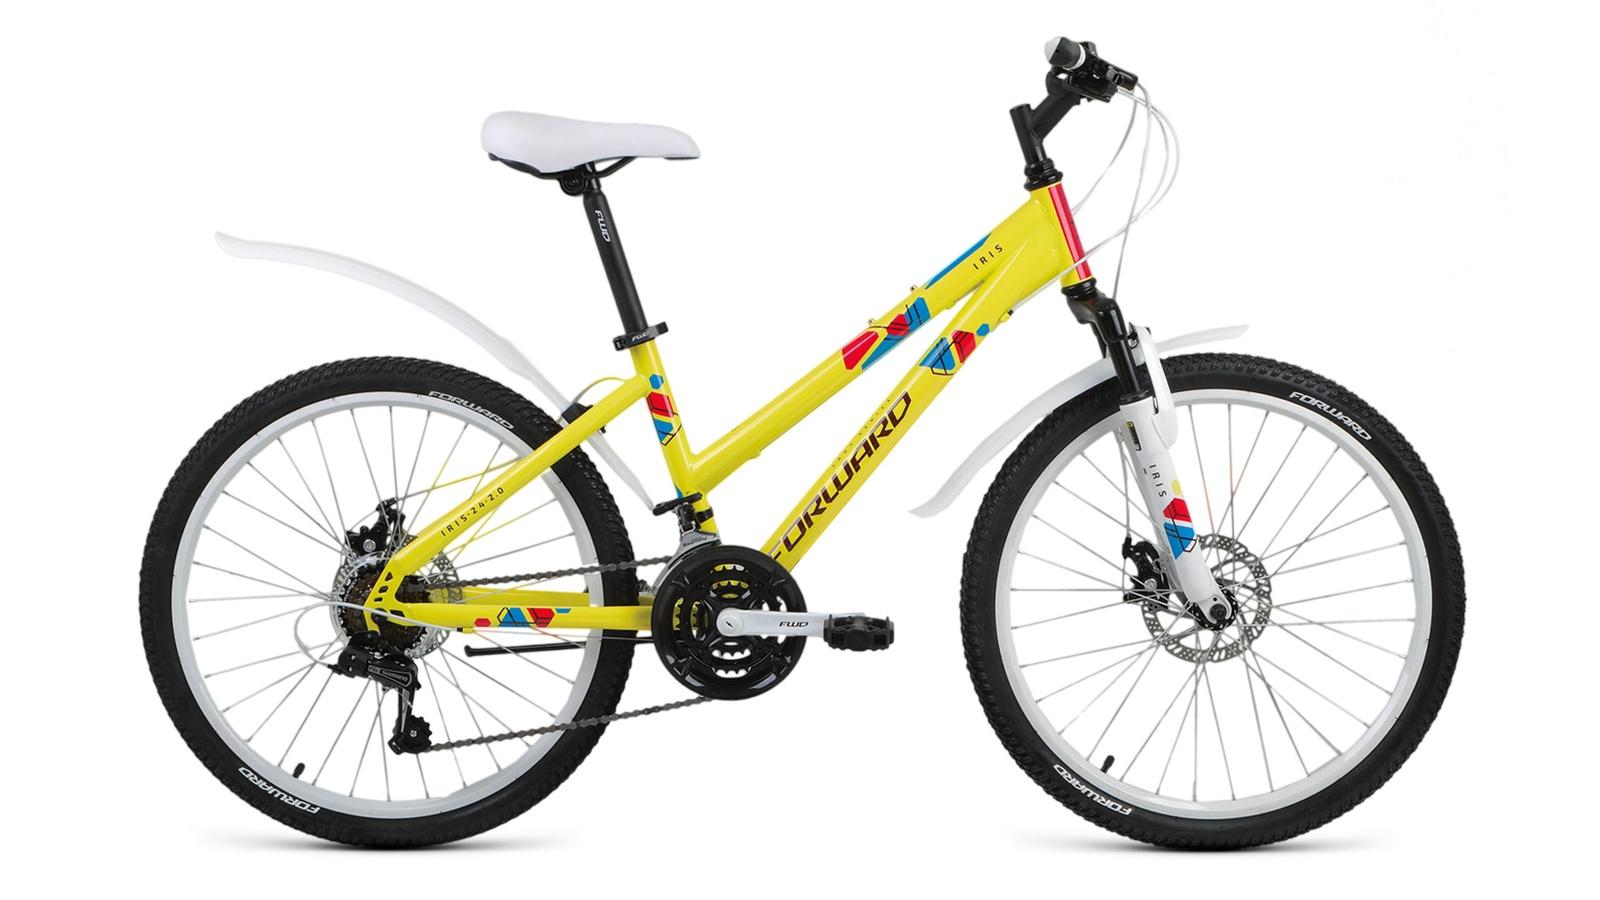 Велосипед Forward Iris 24 2.0 disc, желтый